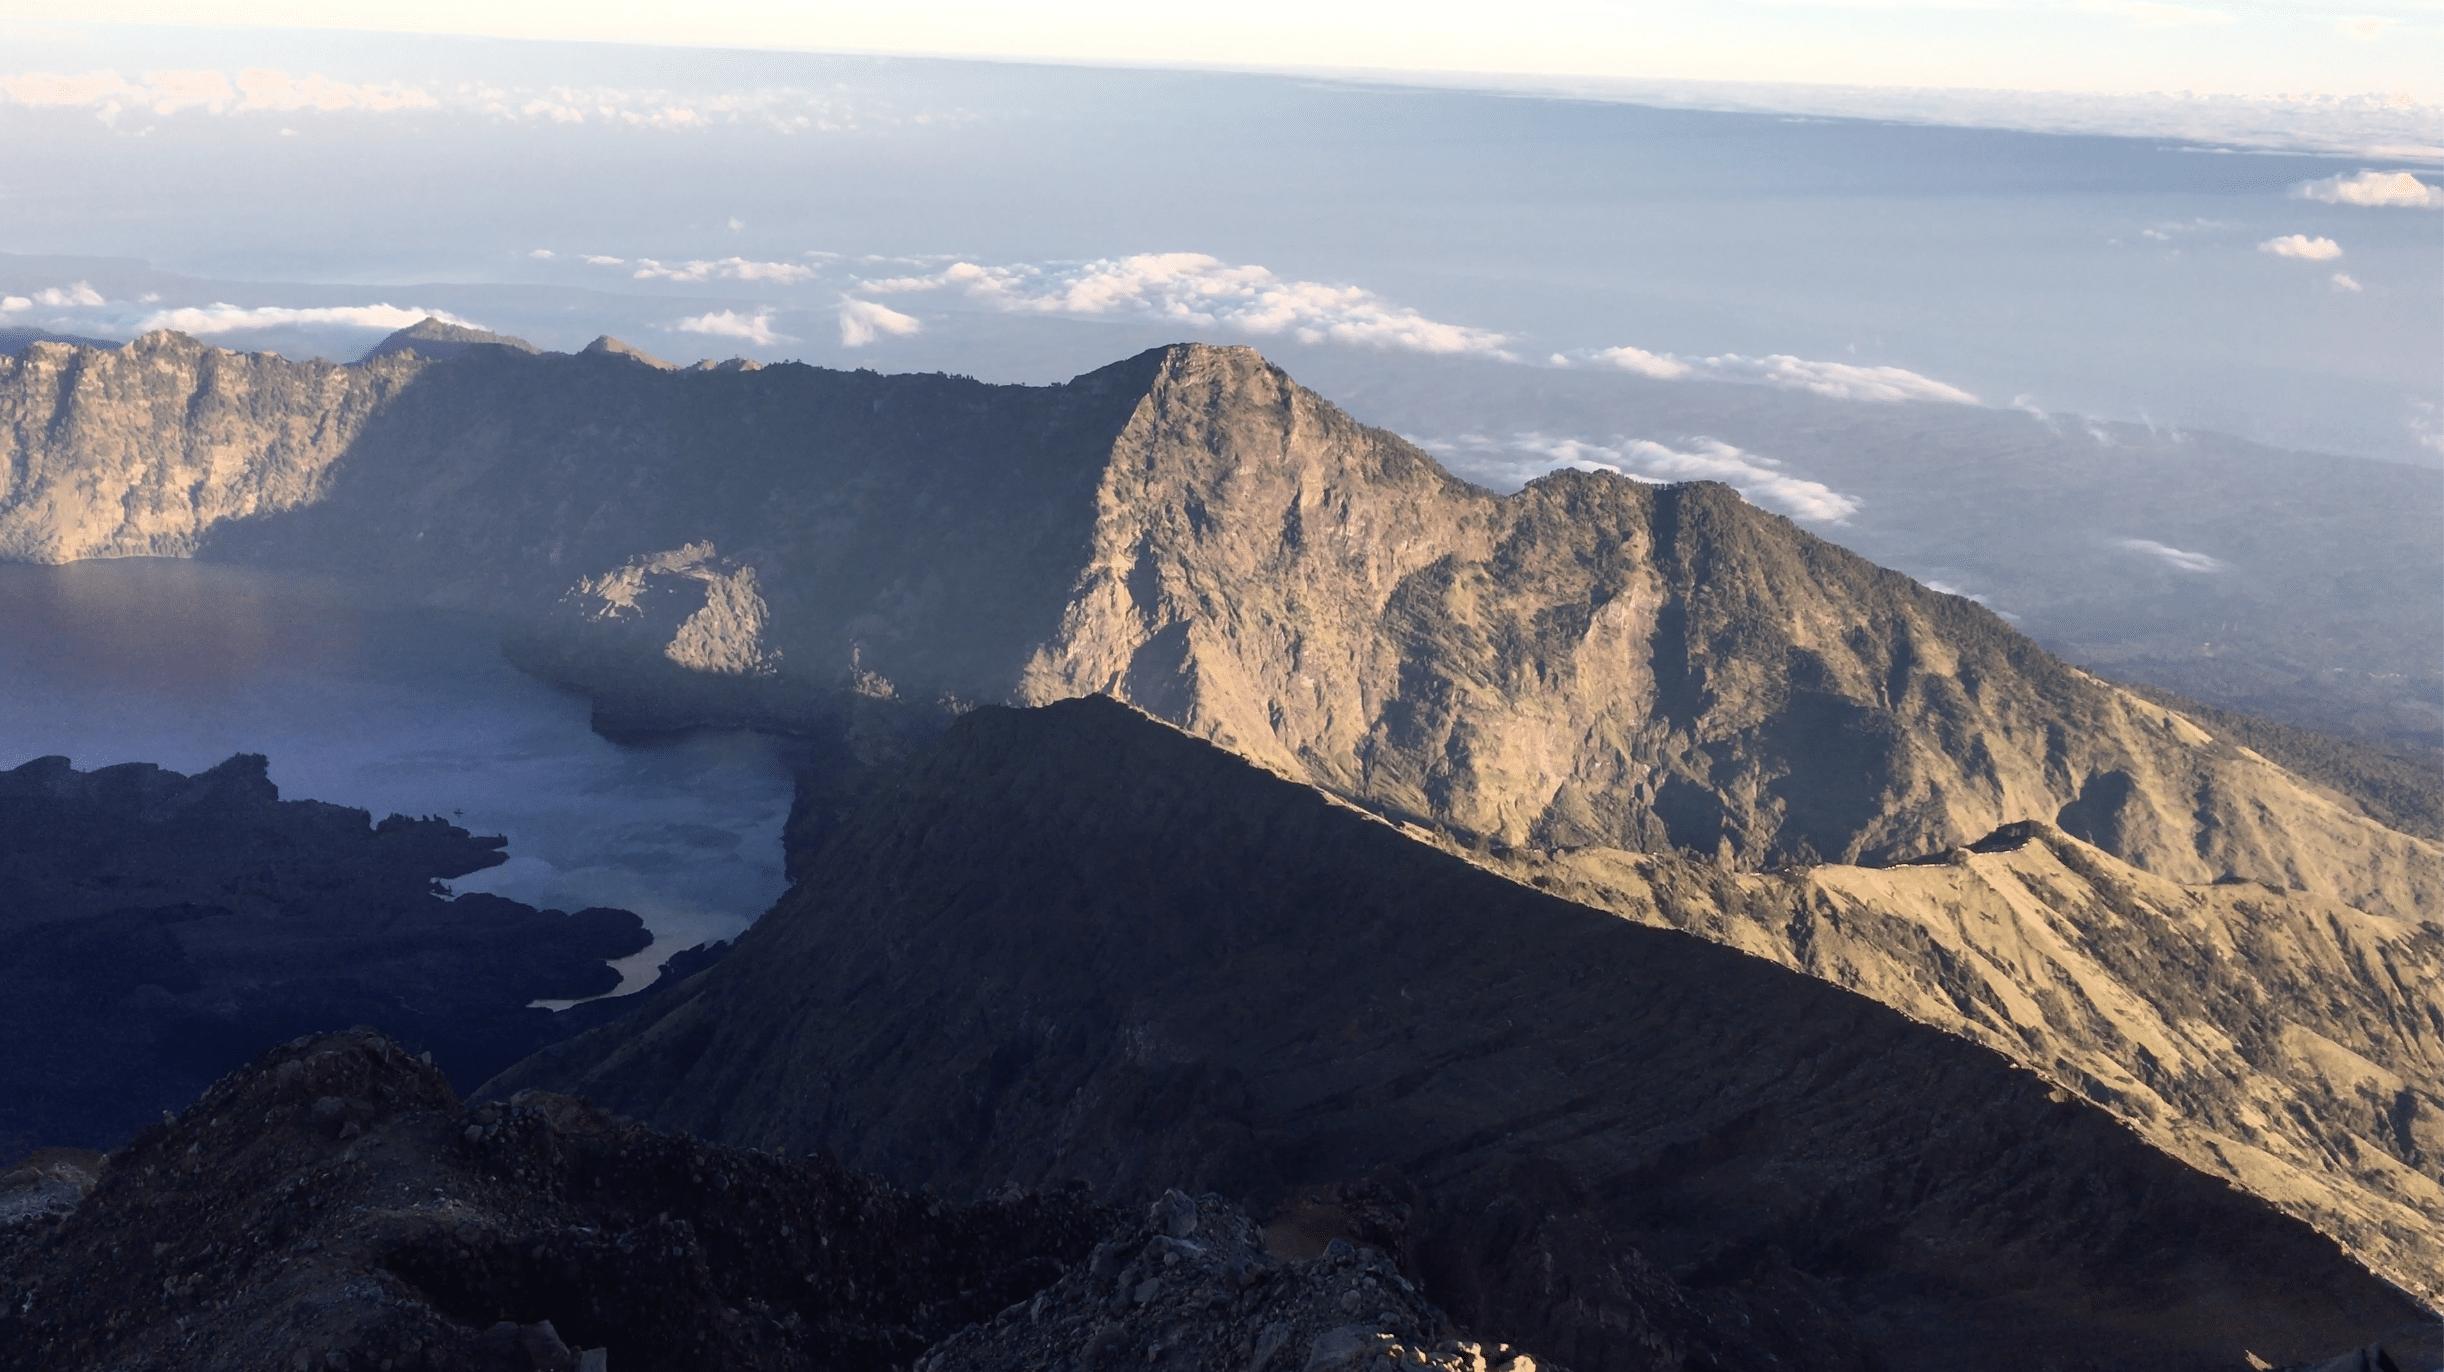 crete du mont rinjani a lombok